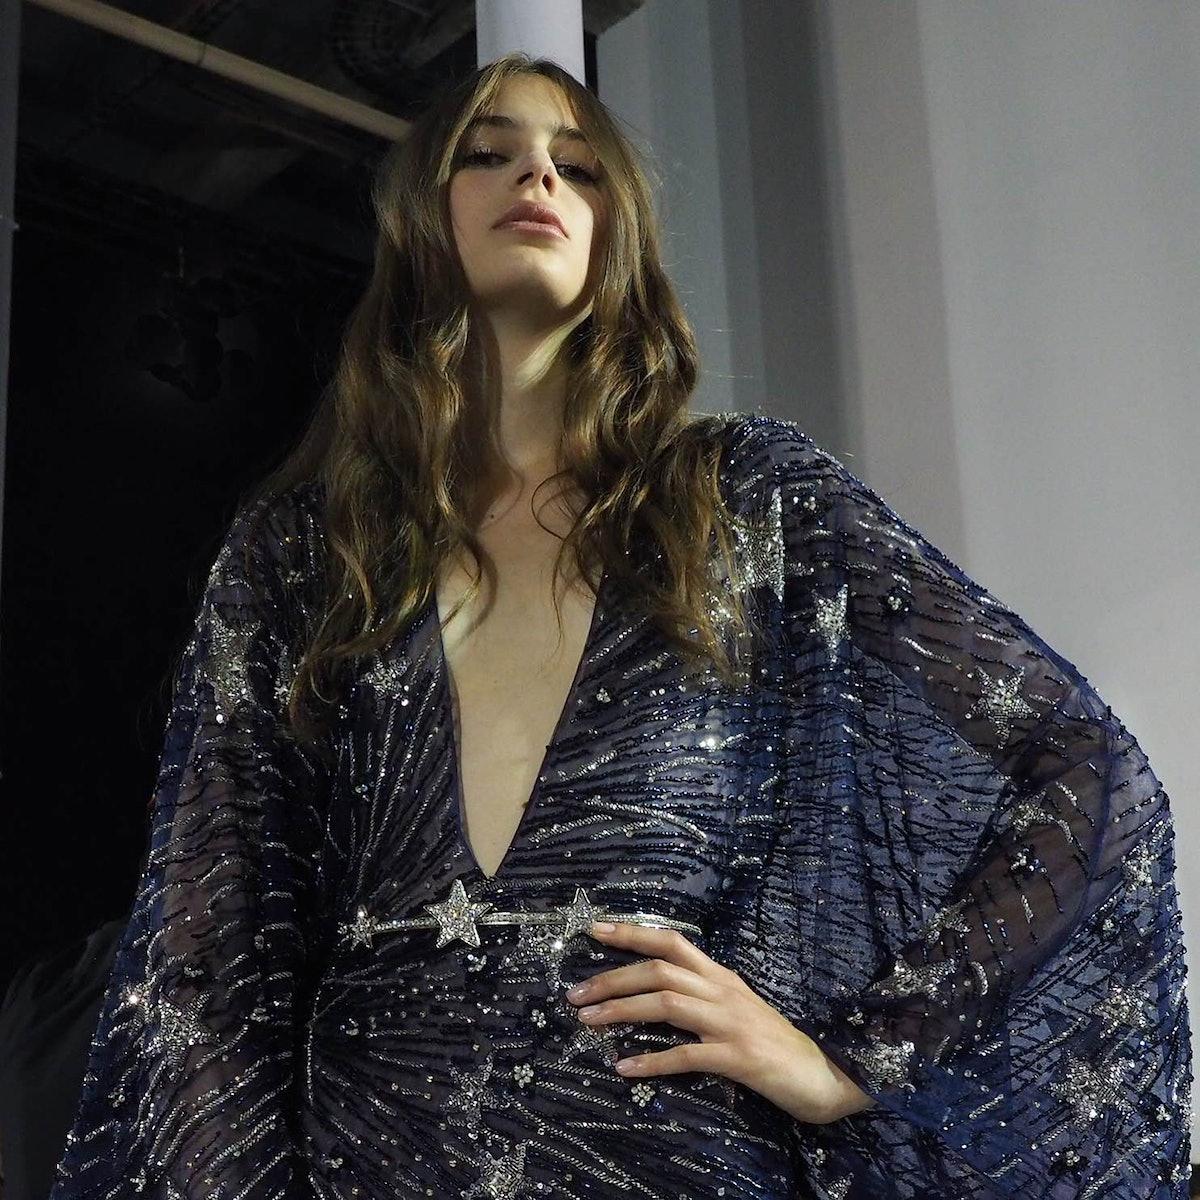 Zuhair Murad Fall 2015 Couture